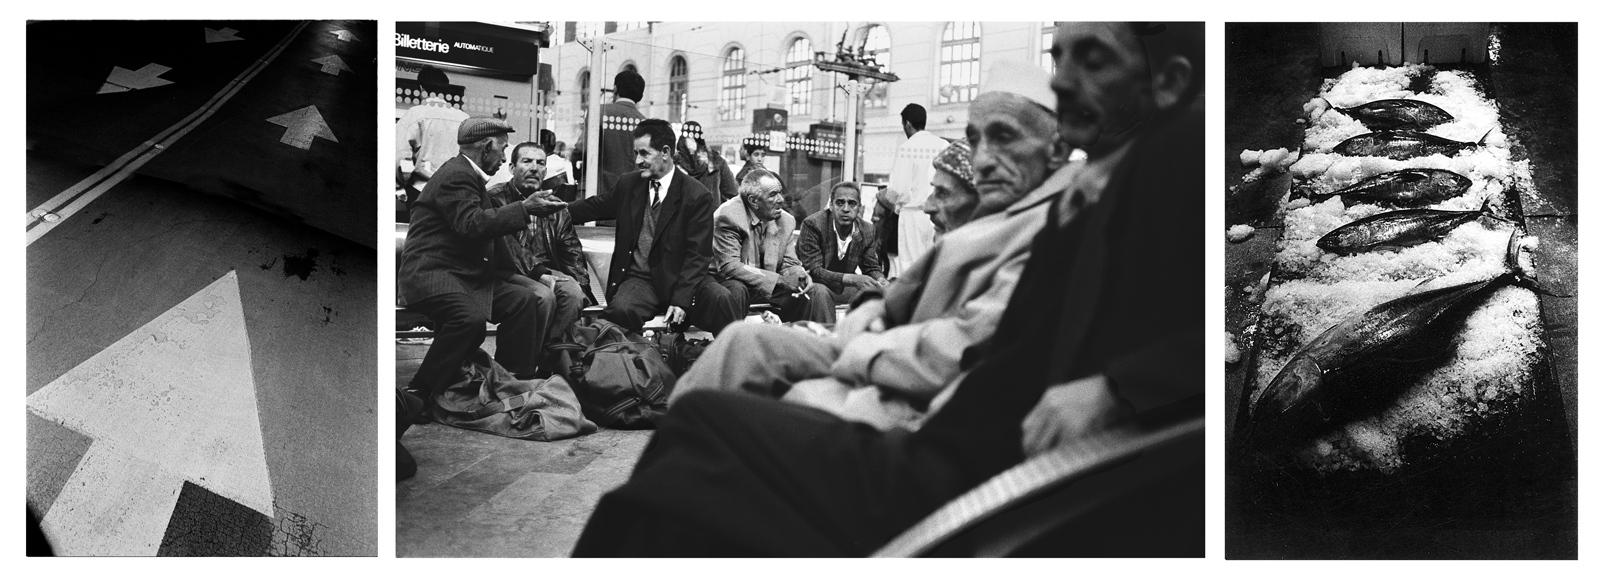 Art and Documentary Photography - Loading 033_b_Marseille___Fabio_Sgroi.jpg